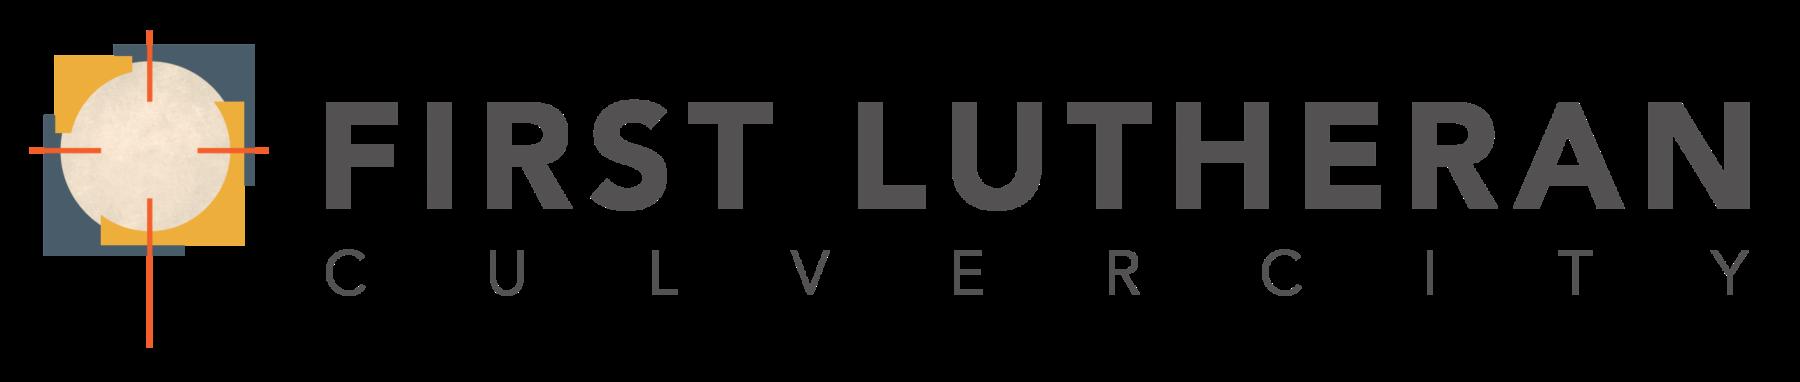 First Lutheran Culver City